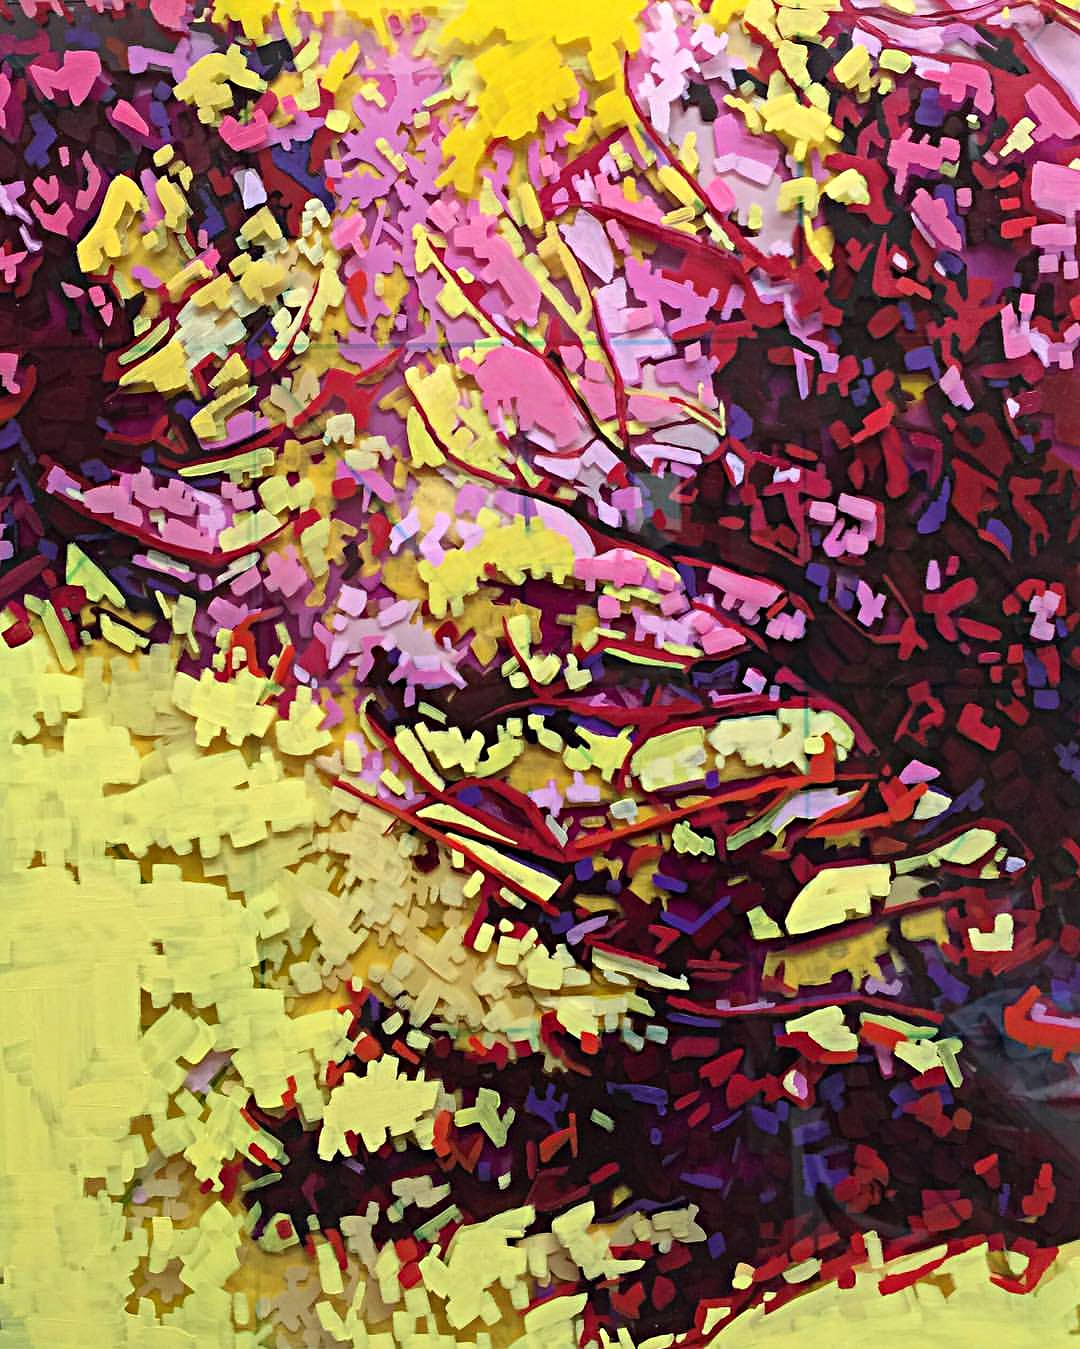 "Joy Of The Day, 20"" x 16"" Acrylic on Multi-Layered Acrylic Glass"